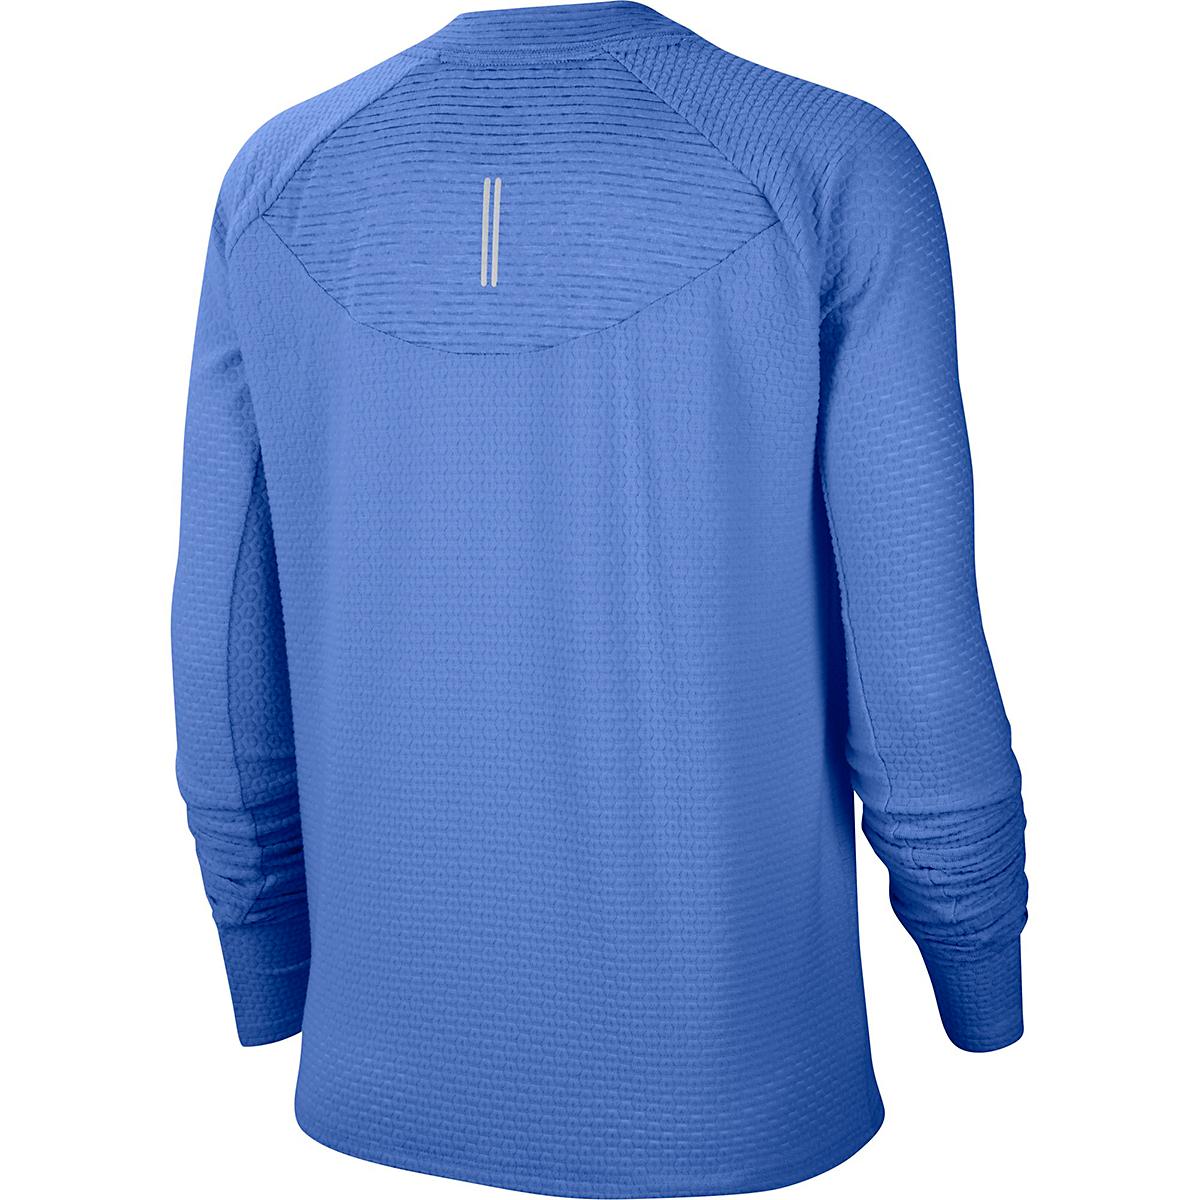 Women's Nike Sphere Crew Long Sleeve Shirt - Color: Royal Pulse/Reflective Silver - Size: XS, Royal Pulse/Reflective Silver, large, image 2